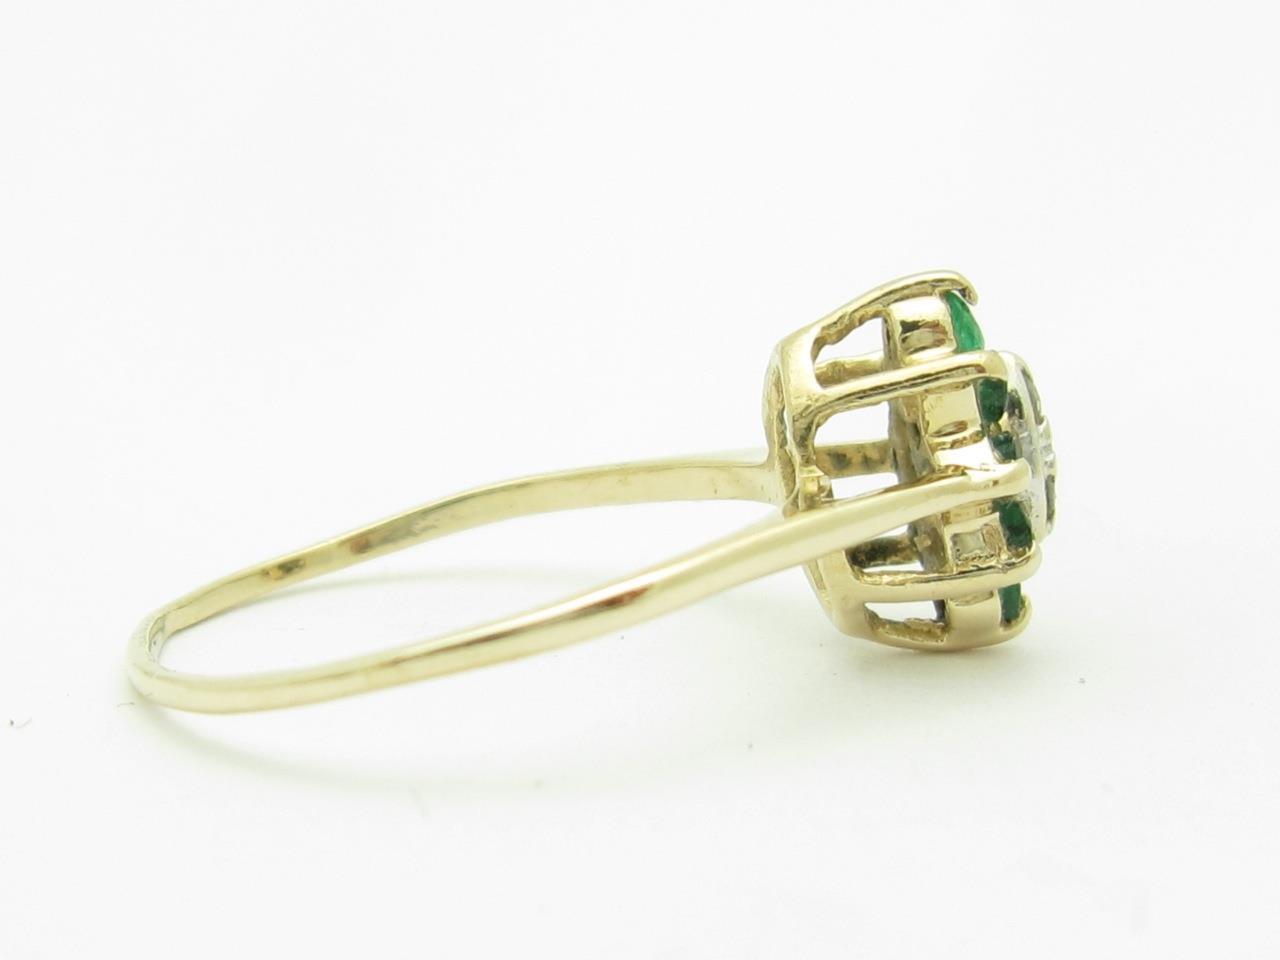 Precious Metal Without Stones 14k Oro Bianco Raso Lucido Finitura Design Fede Nuziale Comodo Da Indossare